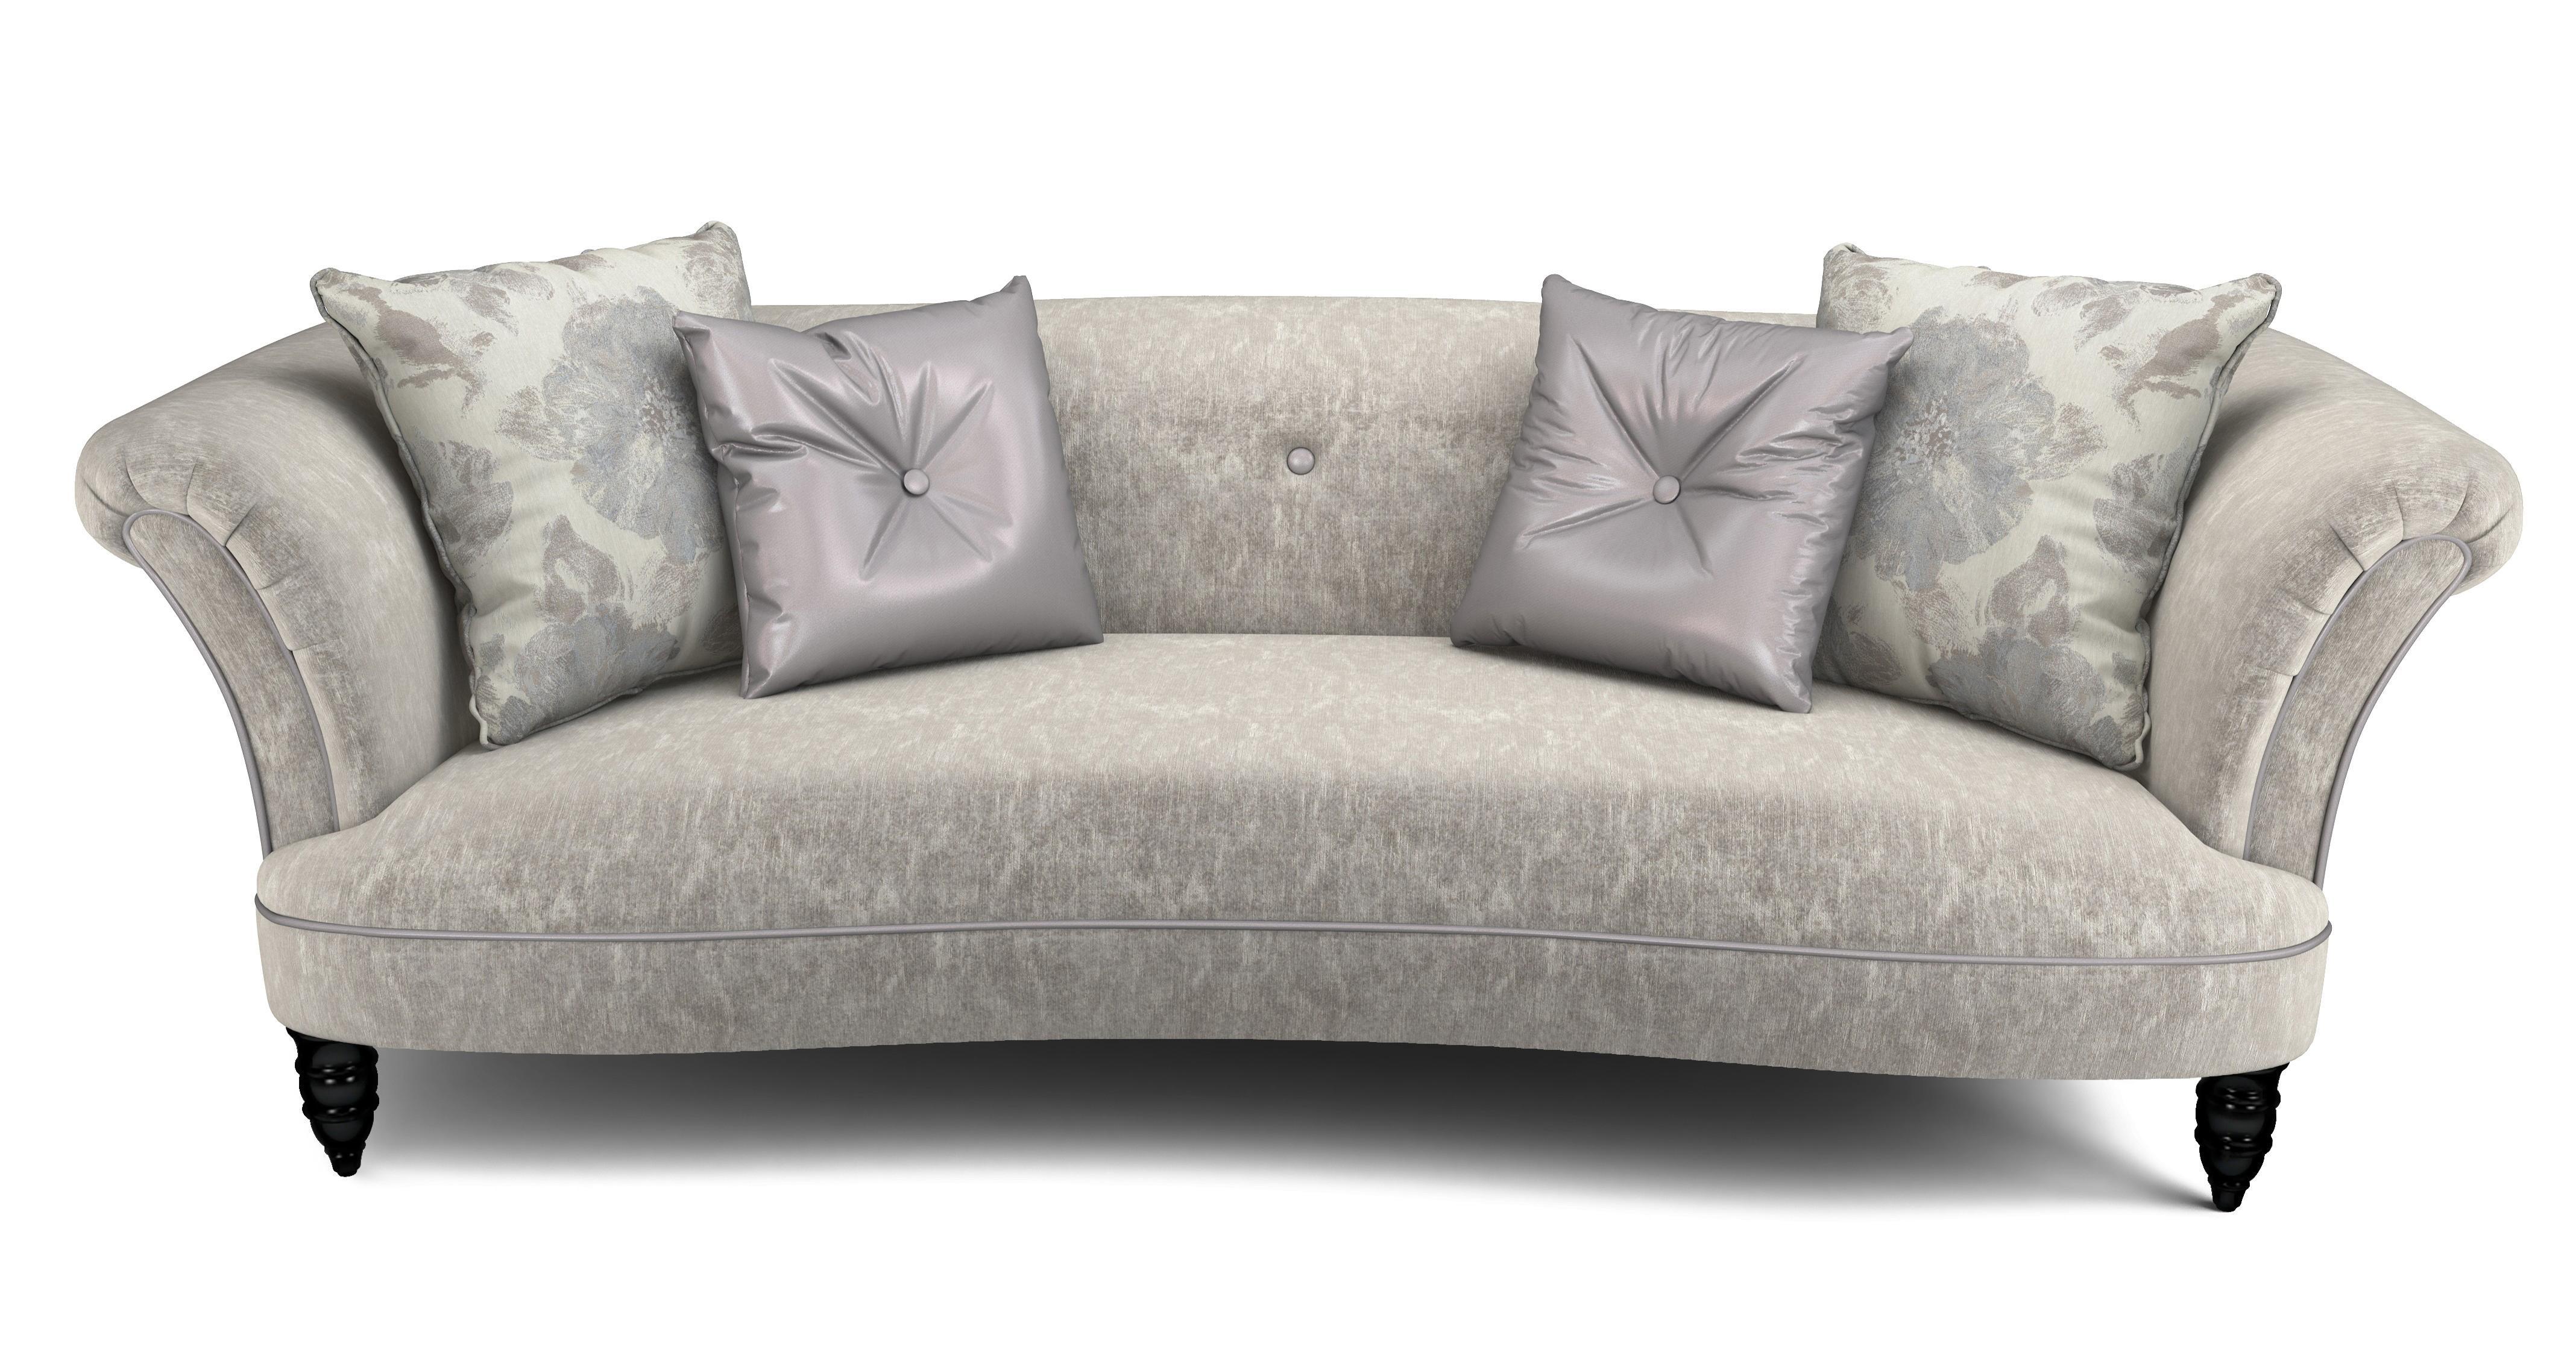 Concerto 4 Seater Sofa | DFS